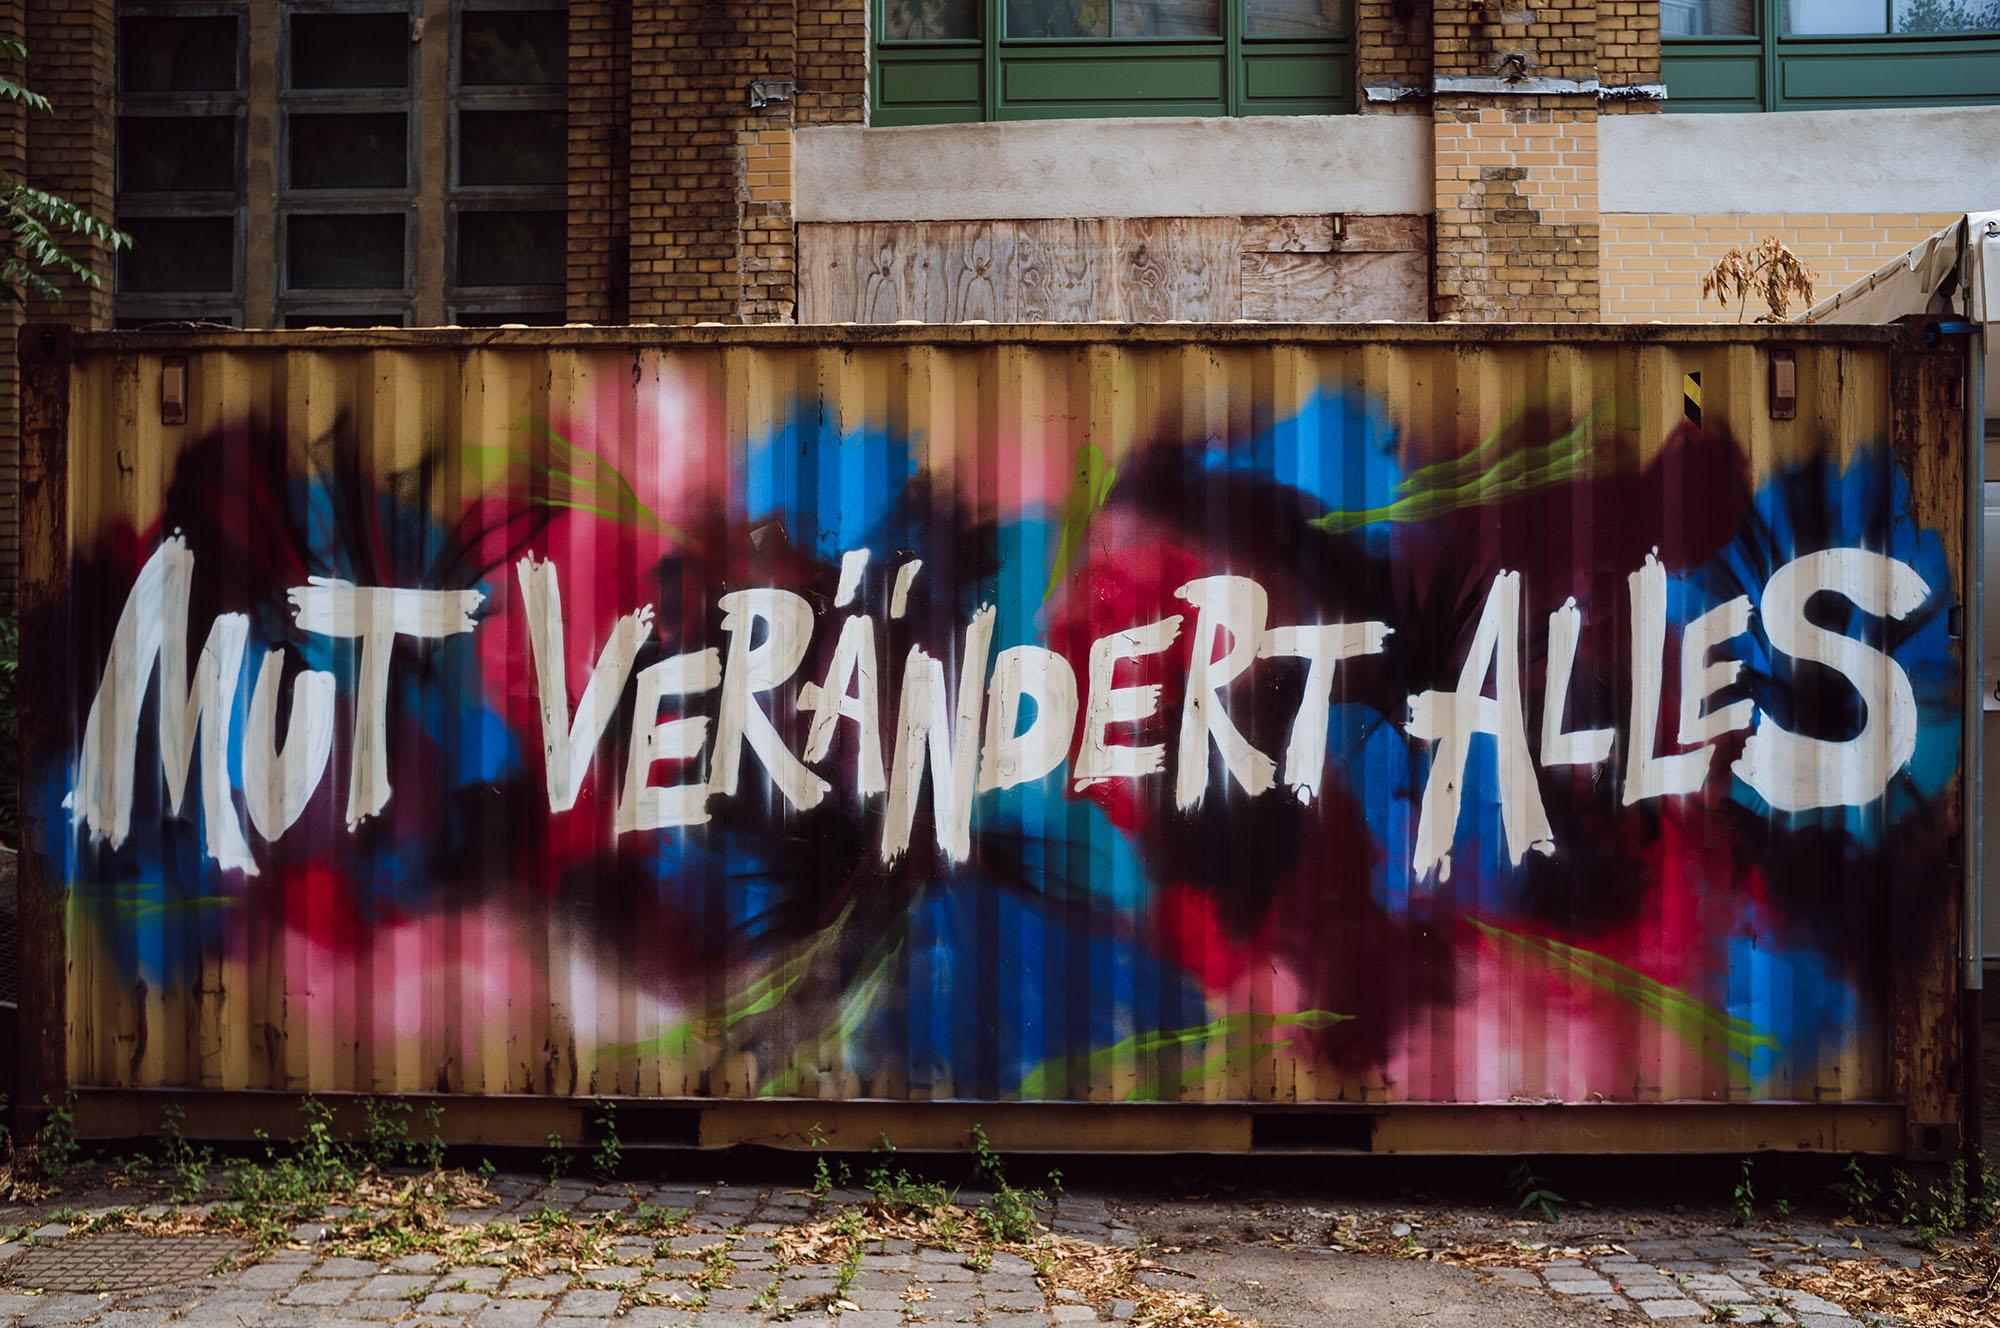 mut veraendert alles courage graffiti